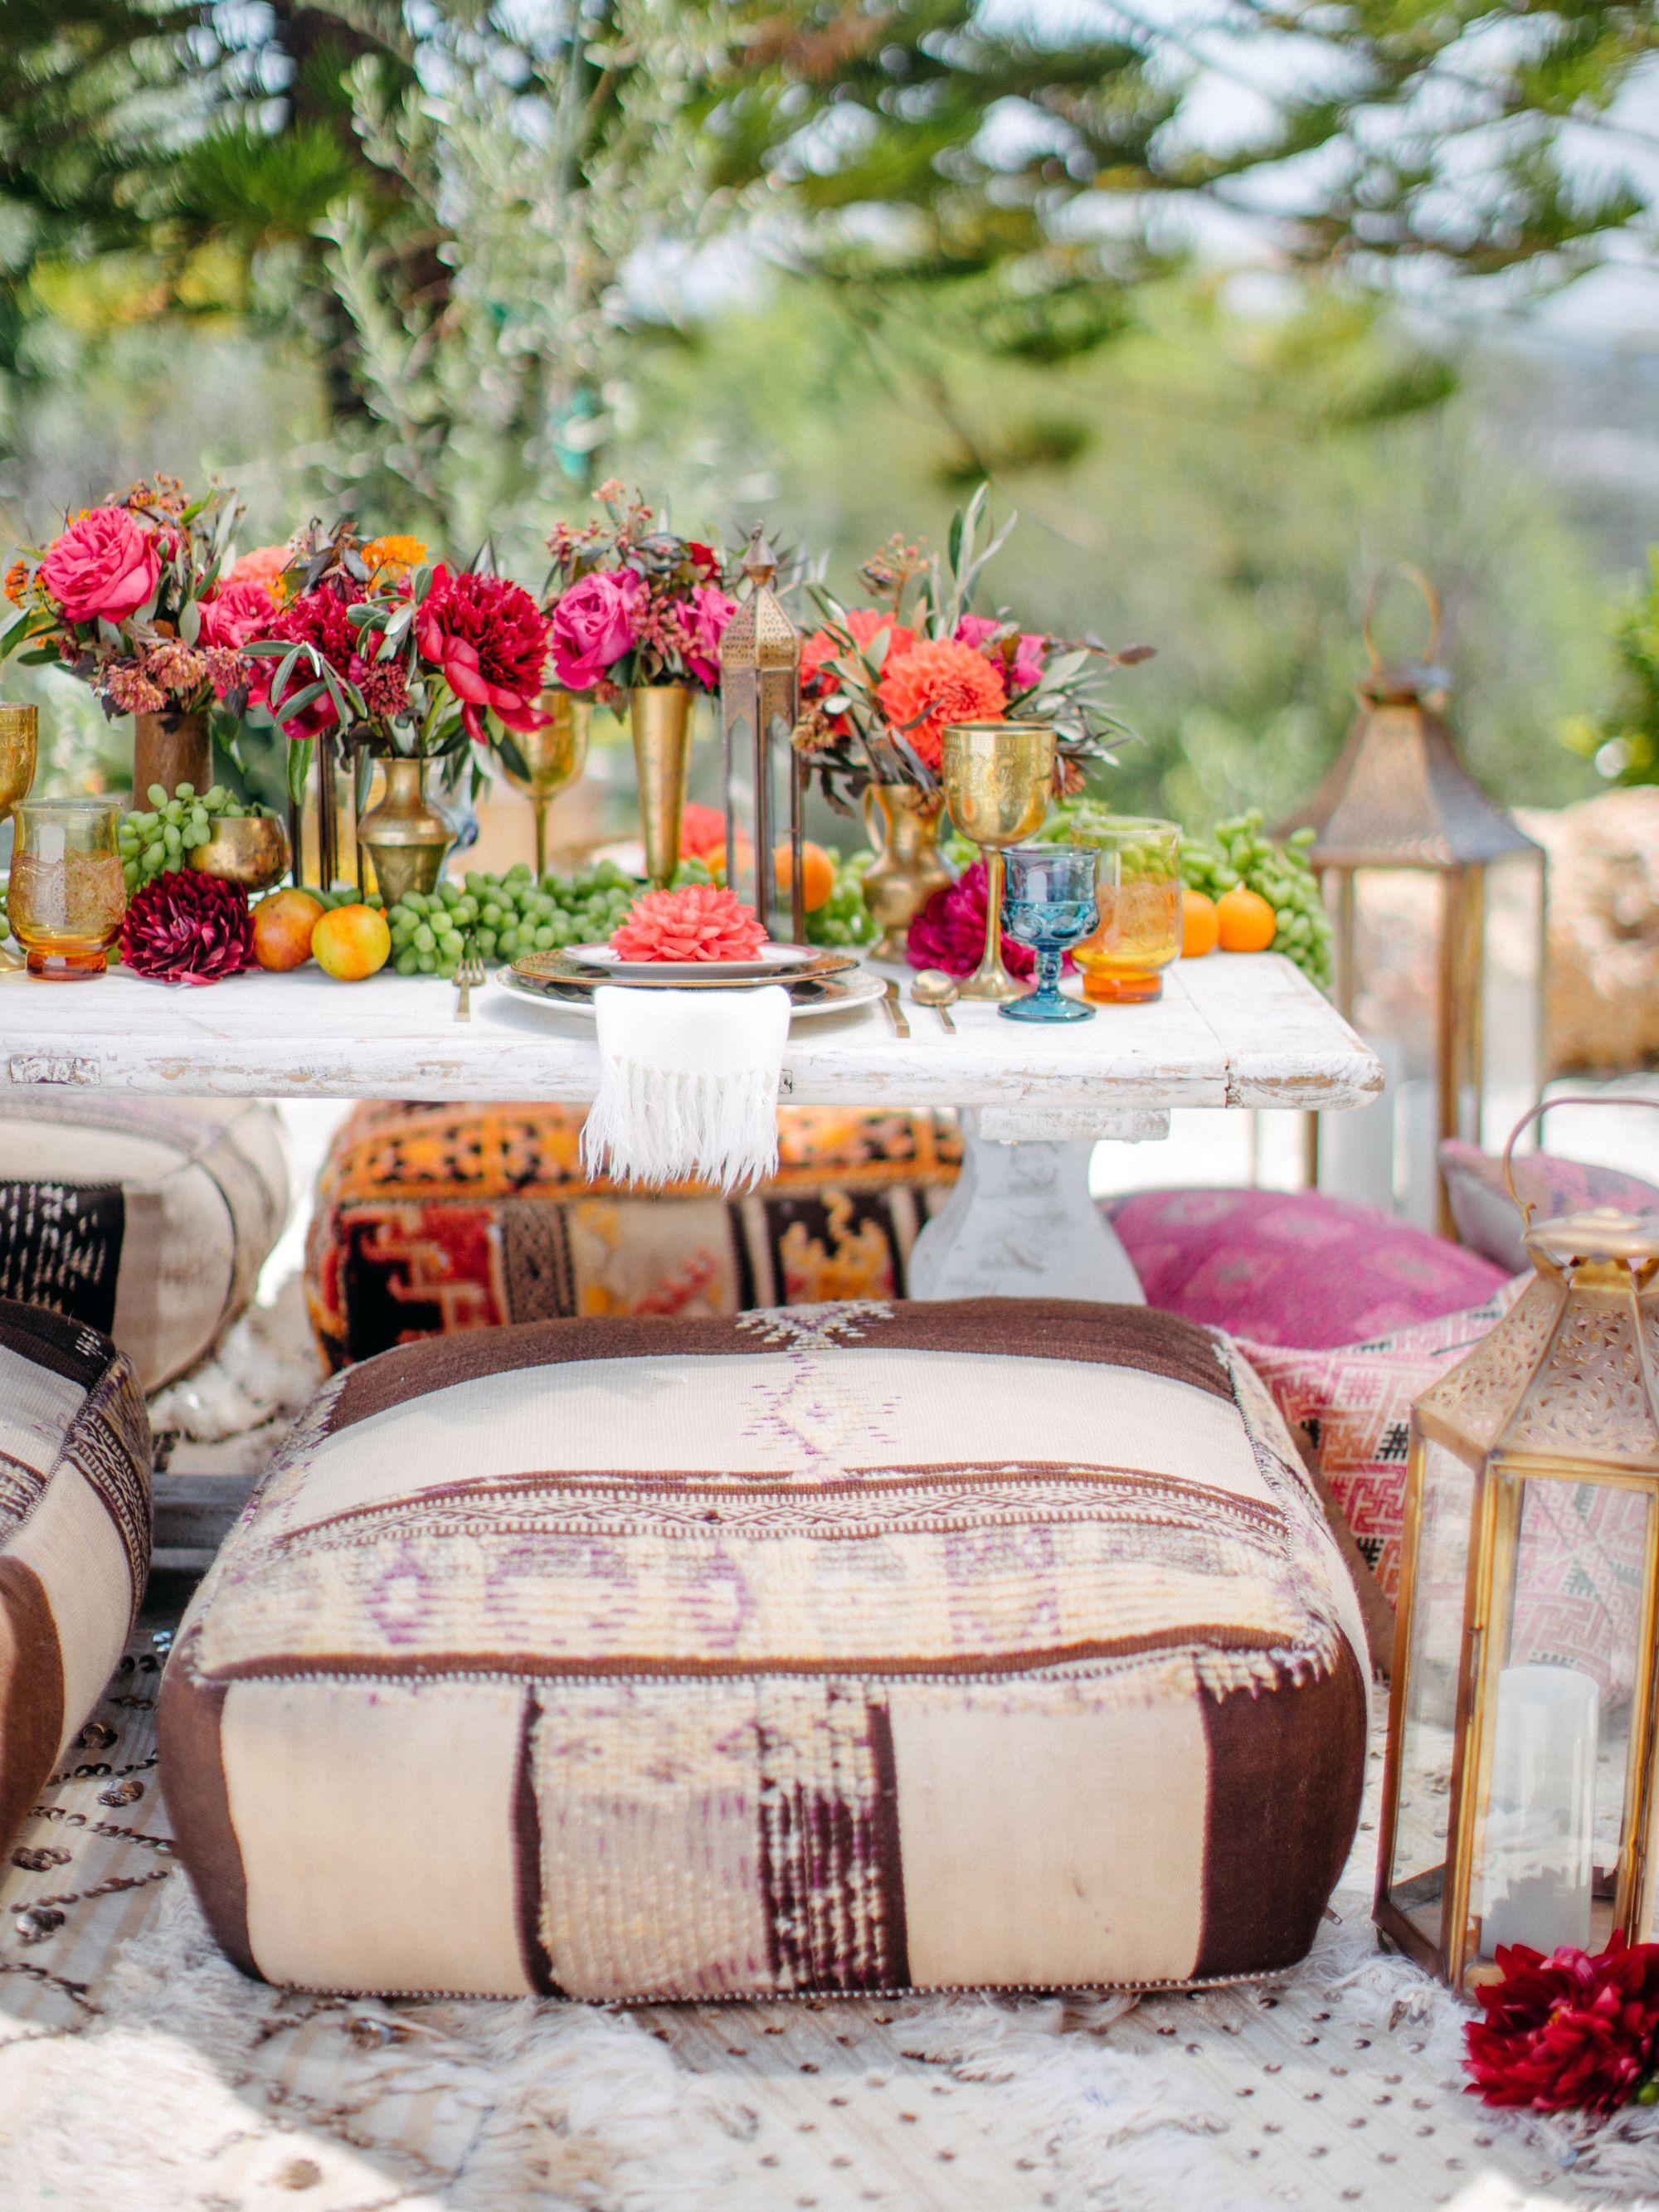 Imagen relacionada home decoraci n marroqu mesas y decoraci n boho Decoracion marruecos